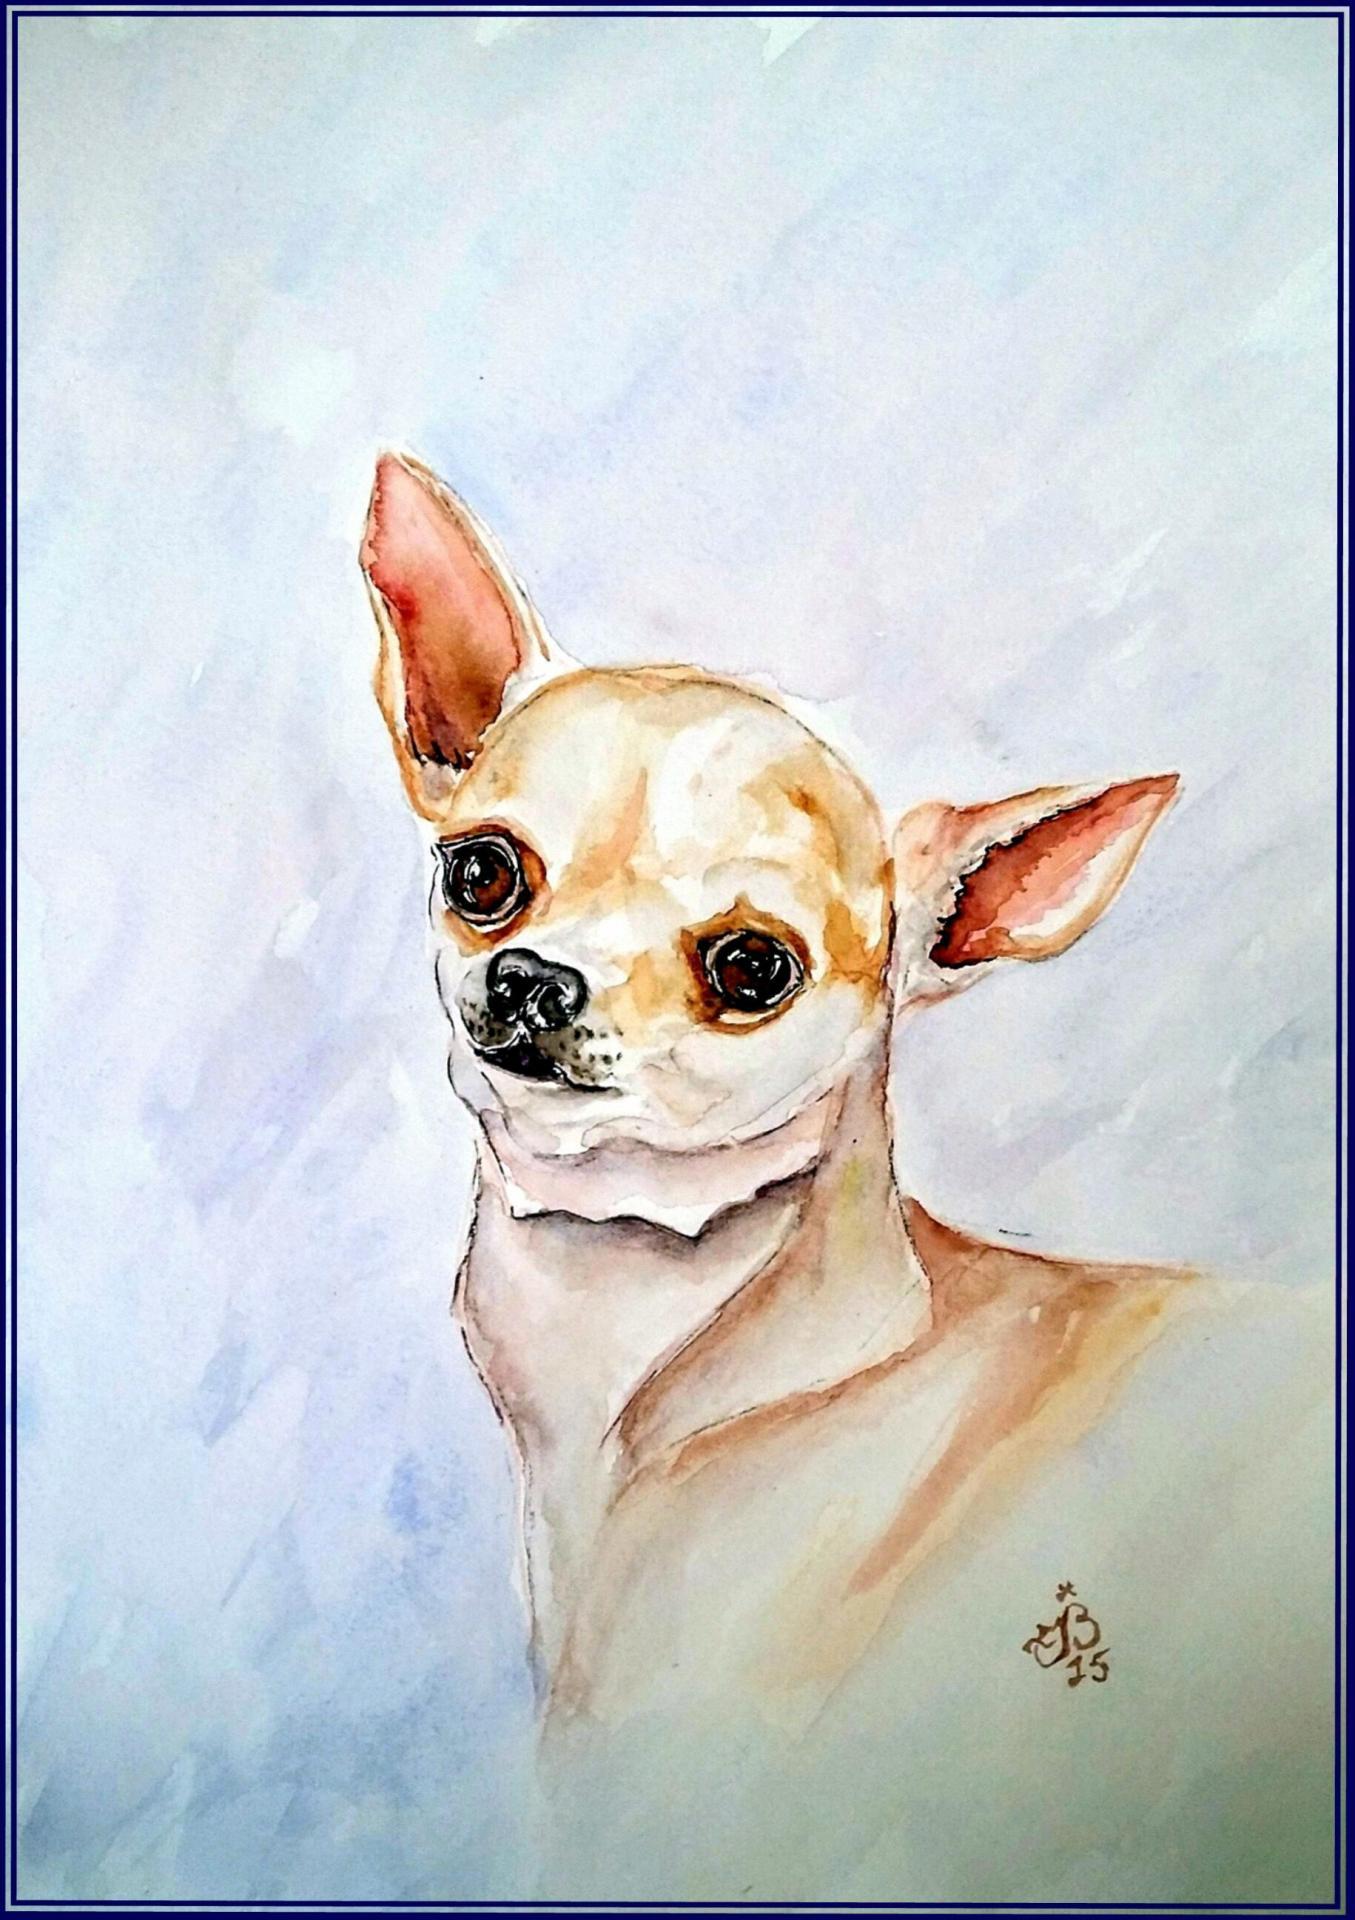 Chihuahua jmb 3